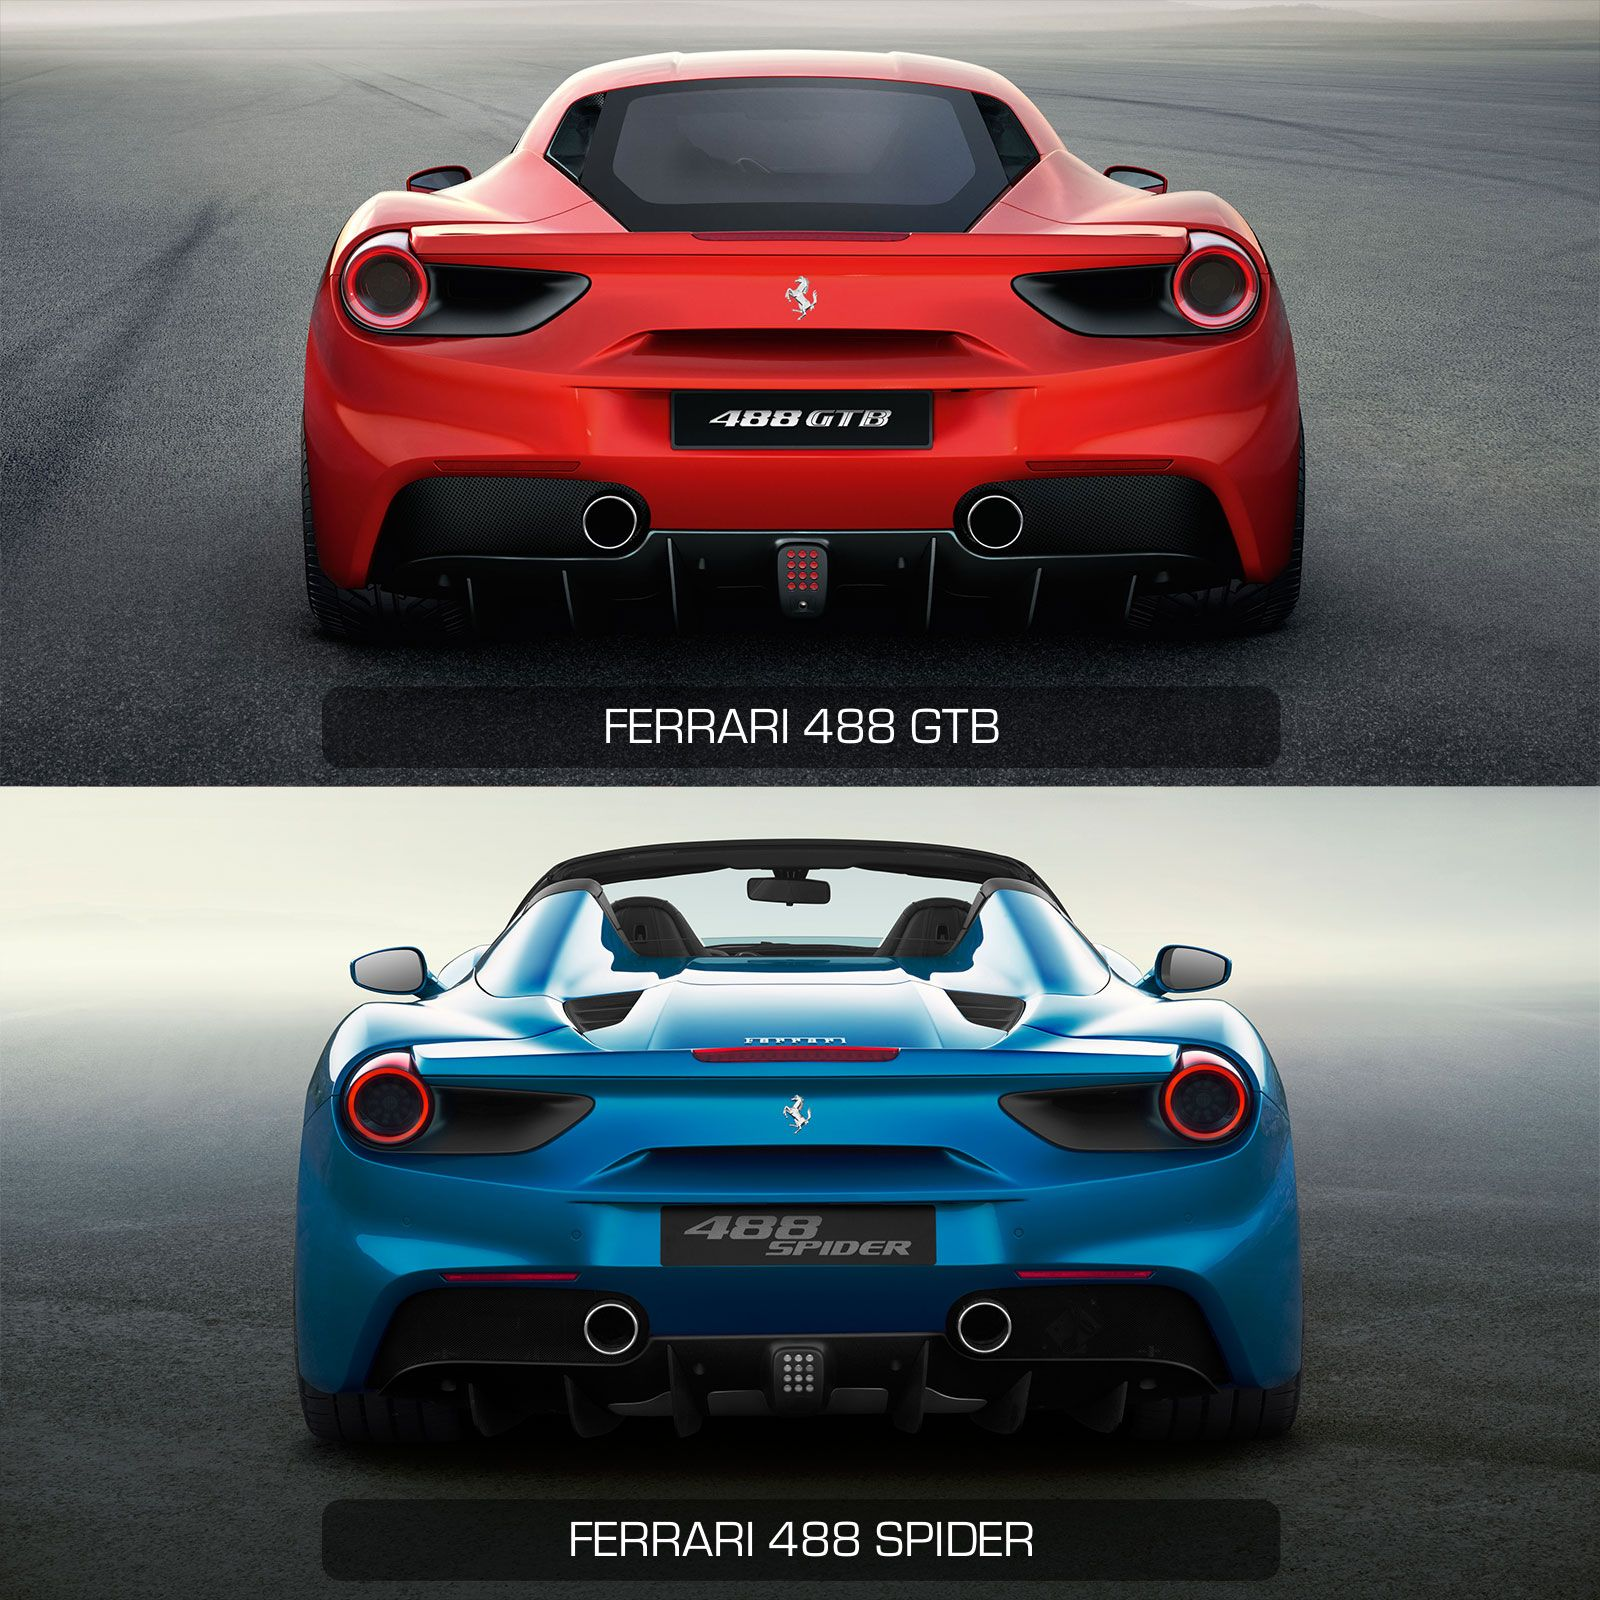 Ferrari Gtb Vs Ferrari Spider Rear View Design